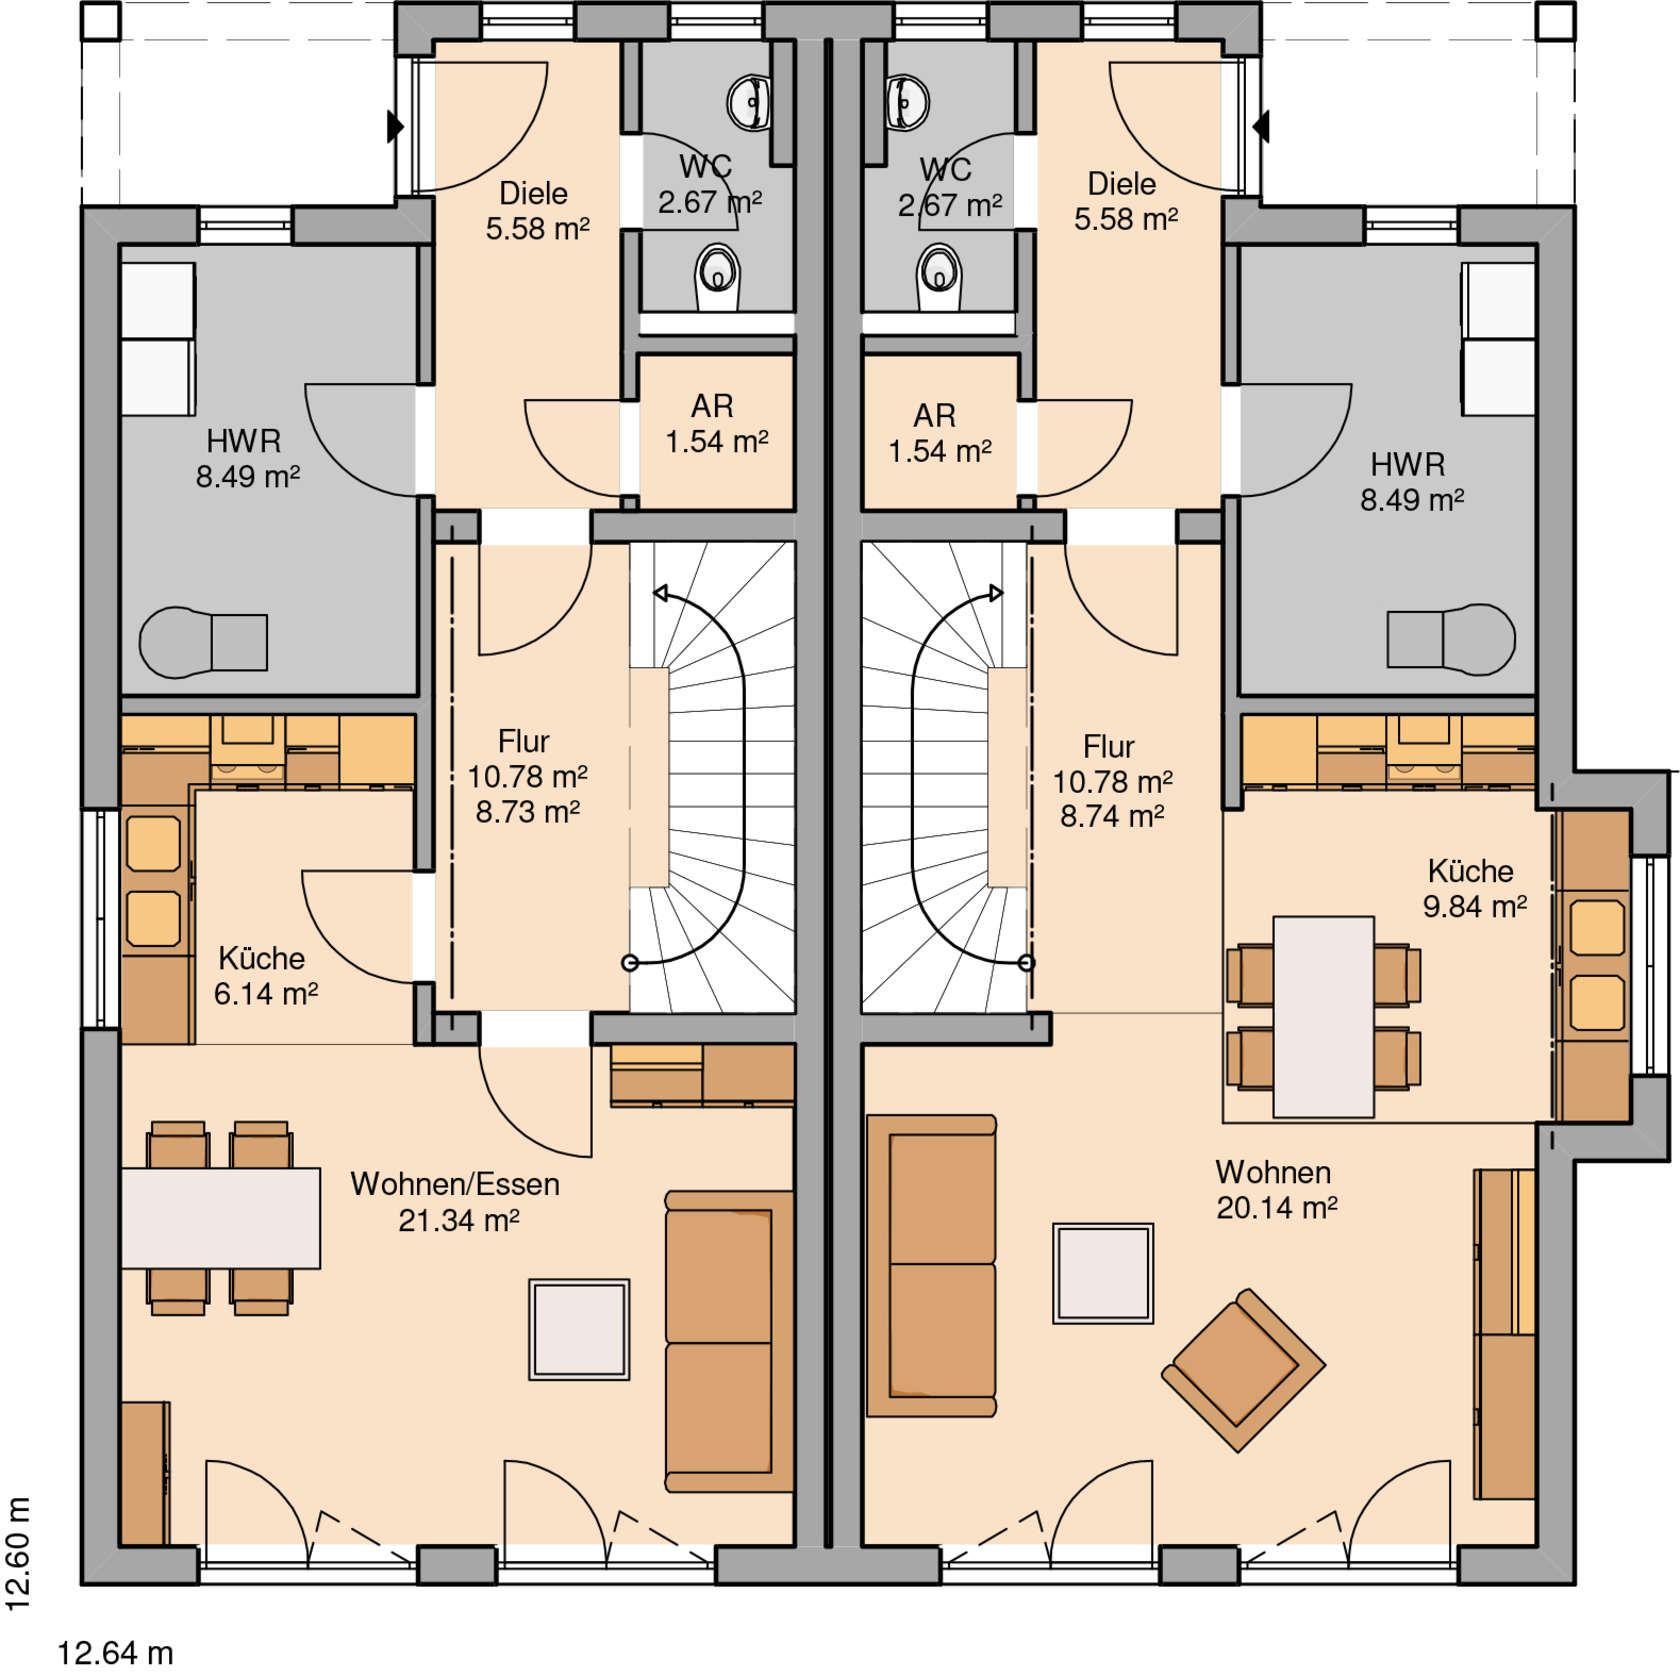 Küchenplan grundriss häuser  birgit  pinterest  haus tiny houses and house